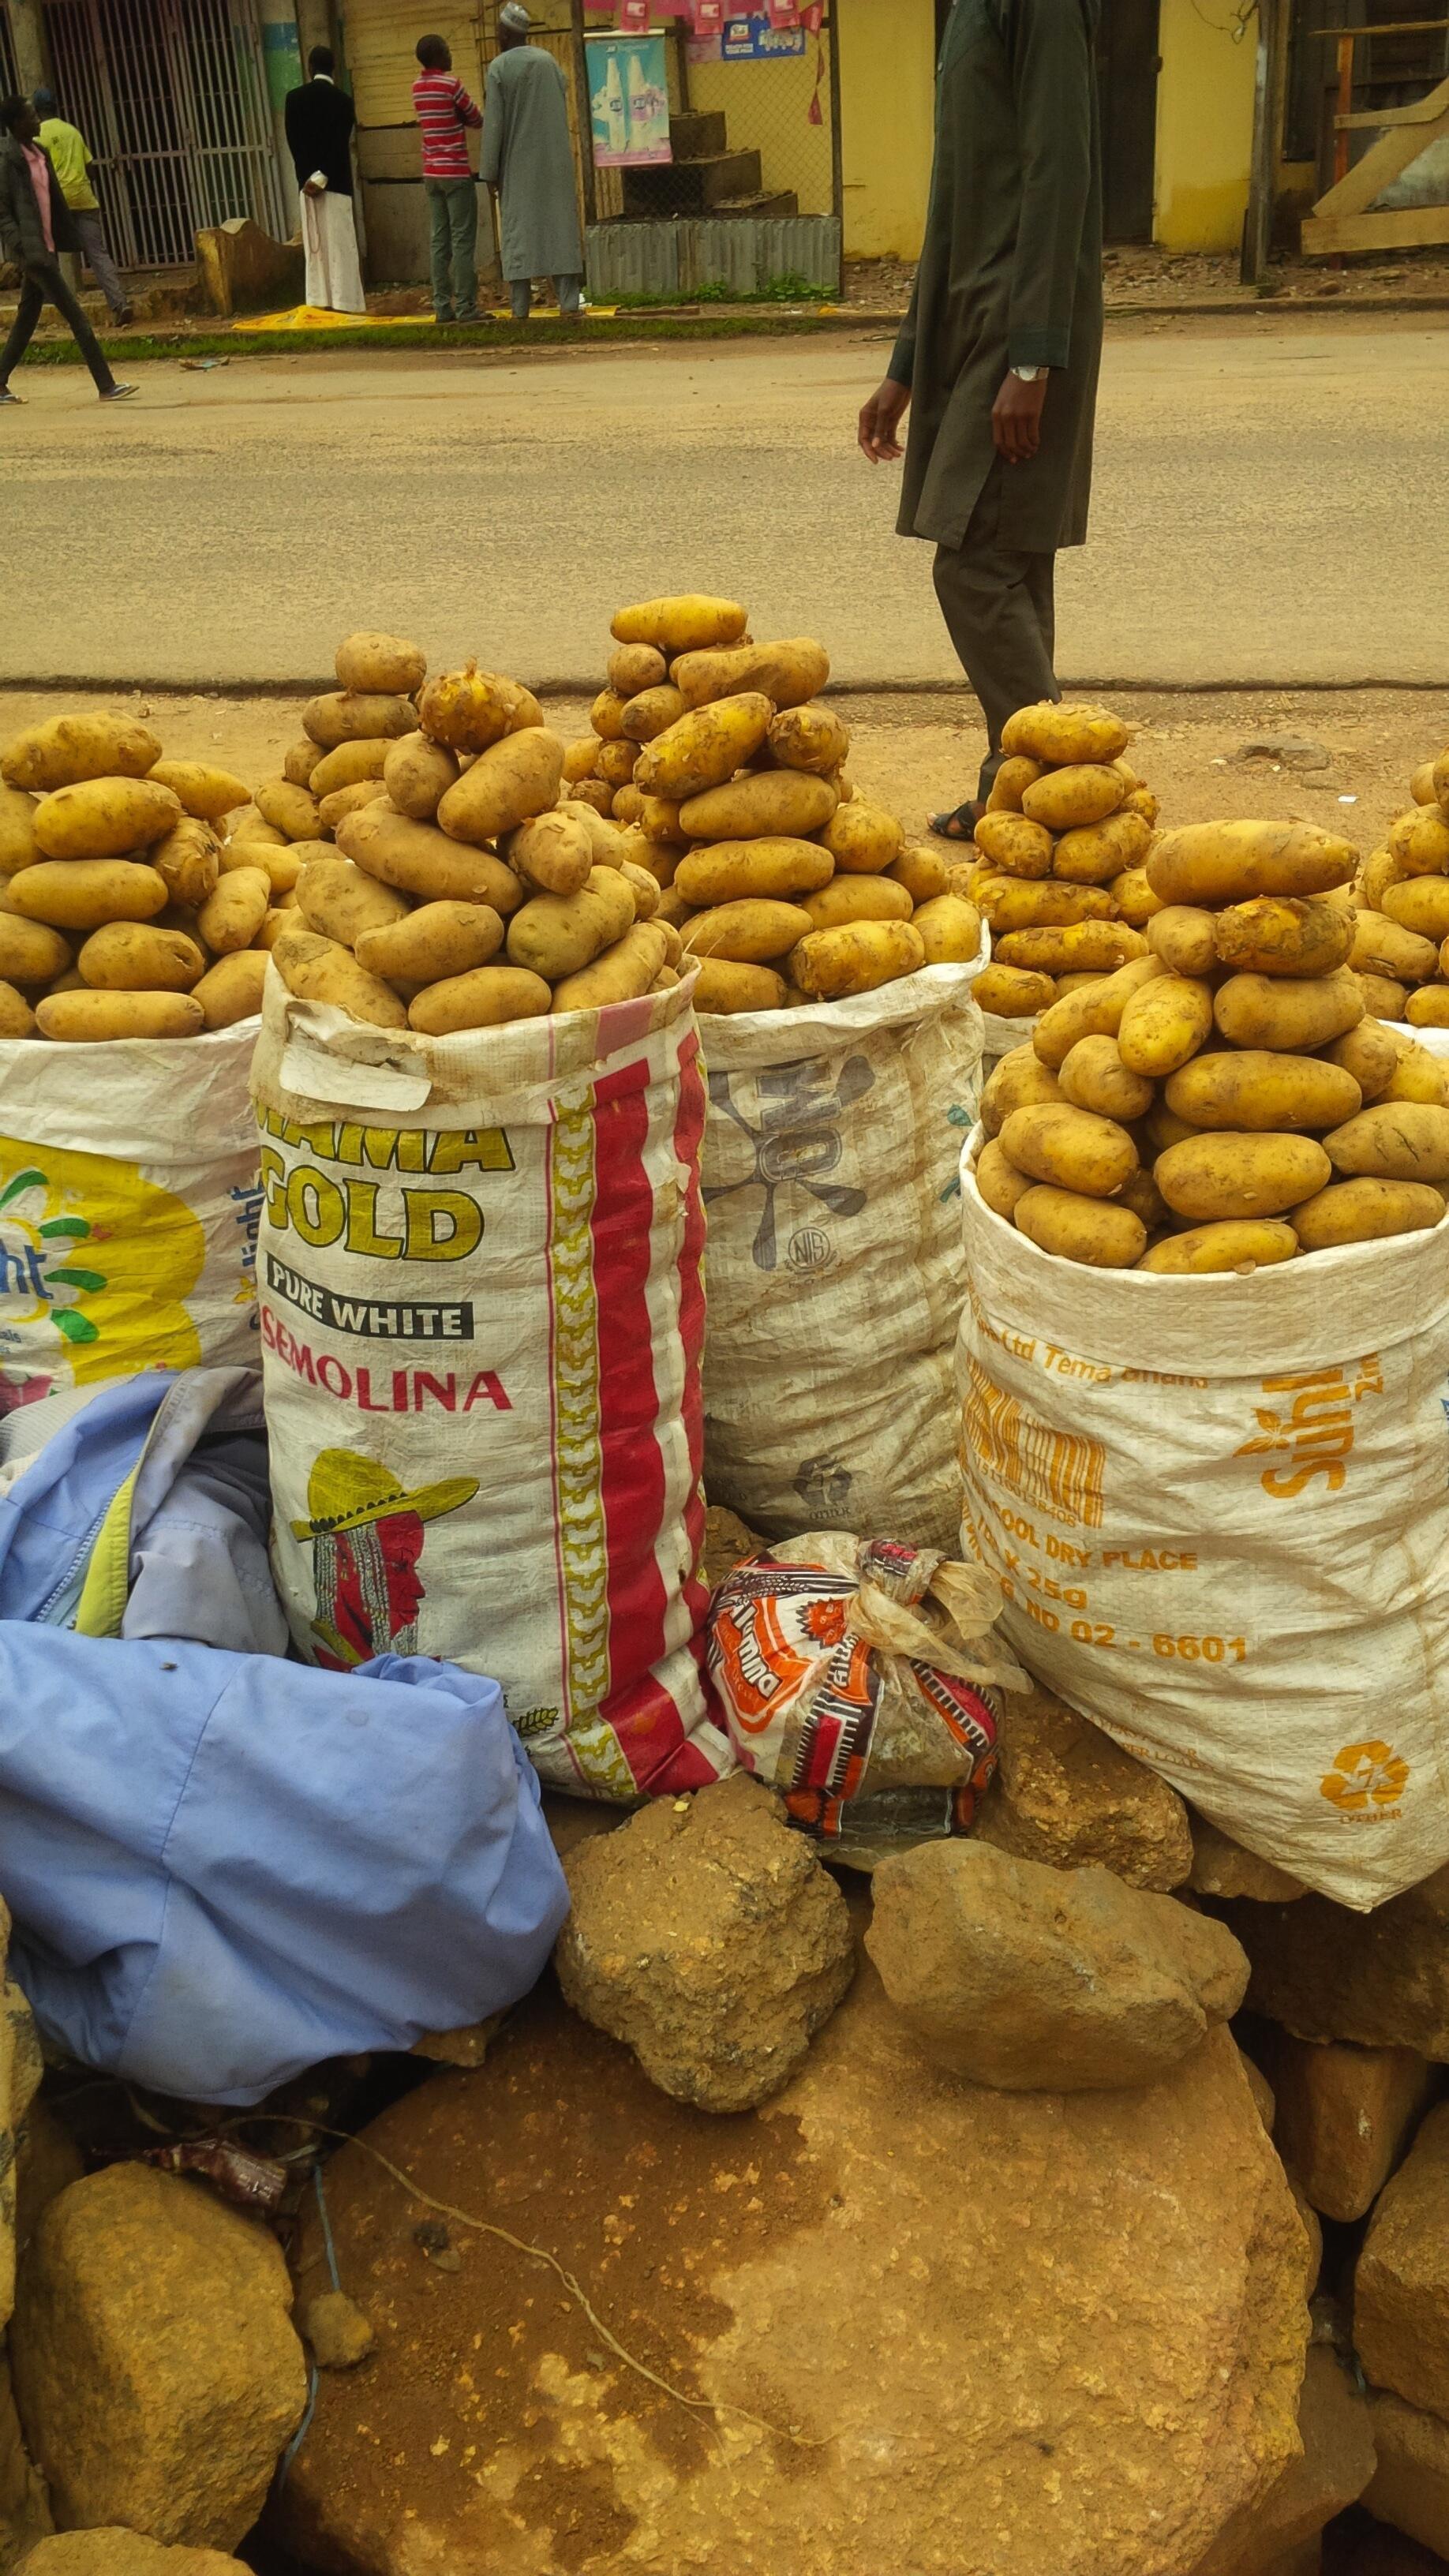 Potato farming